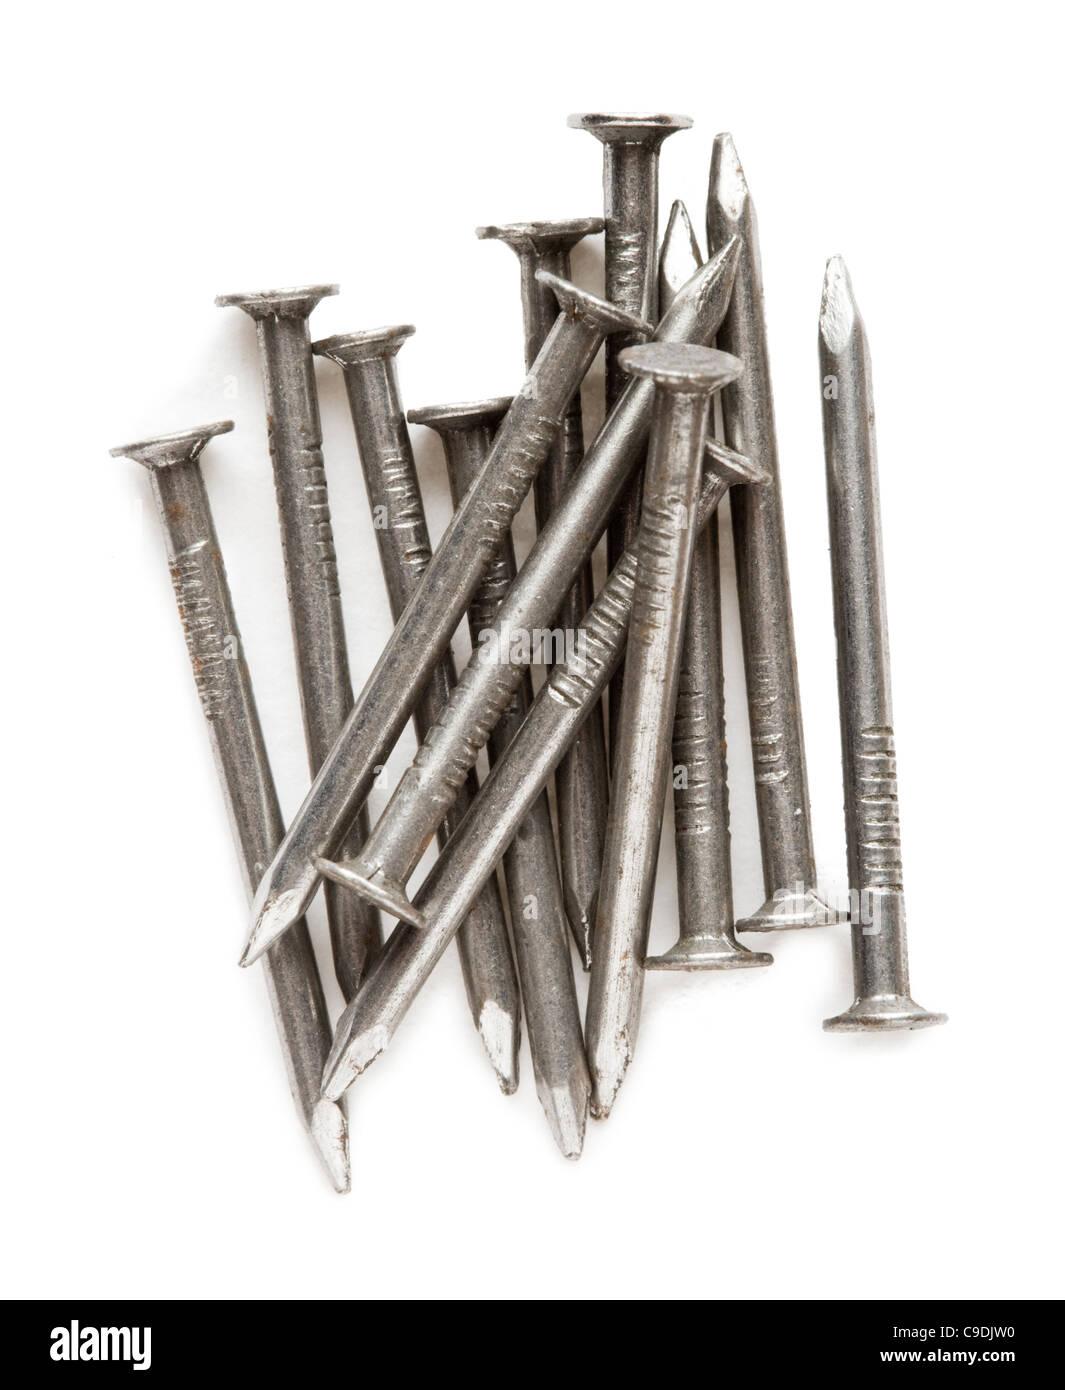 Nails. - Stock Image